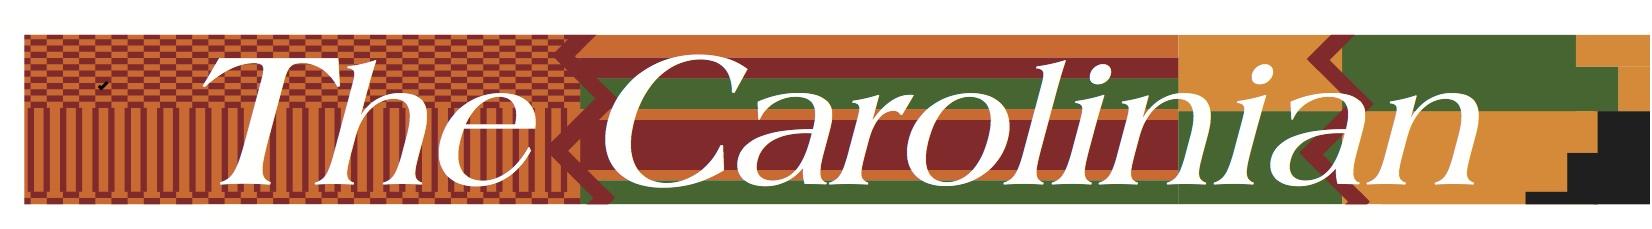 Carolinianlogo copy